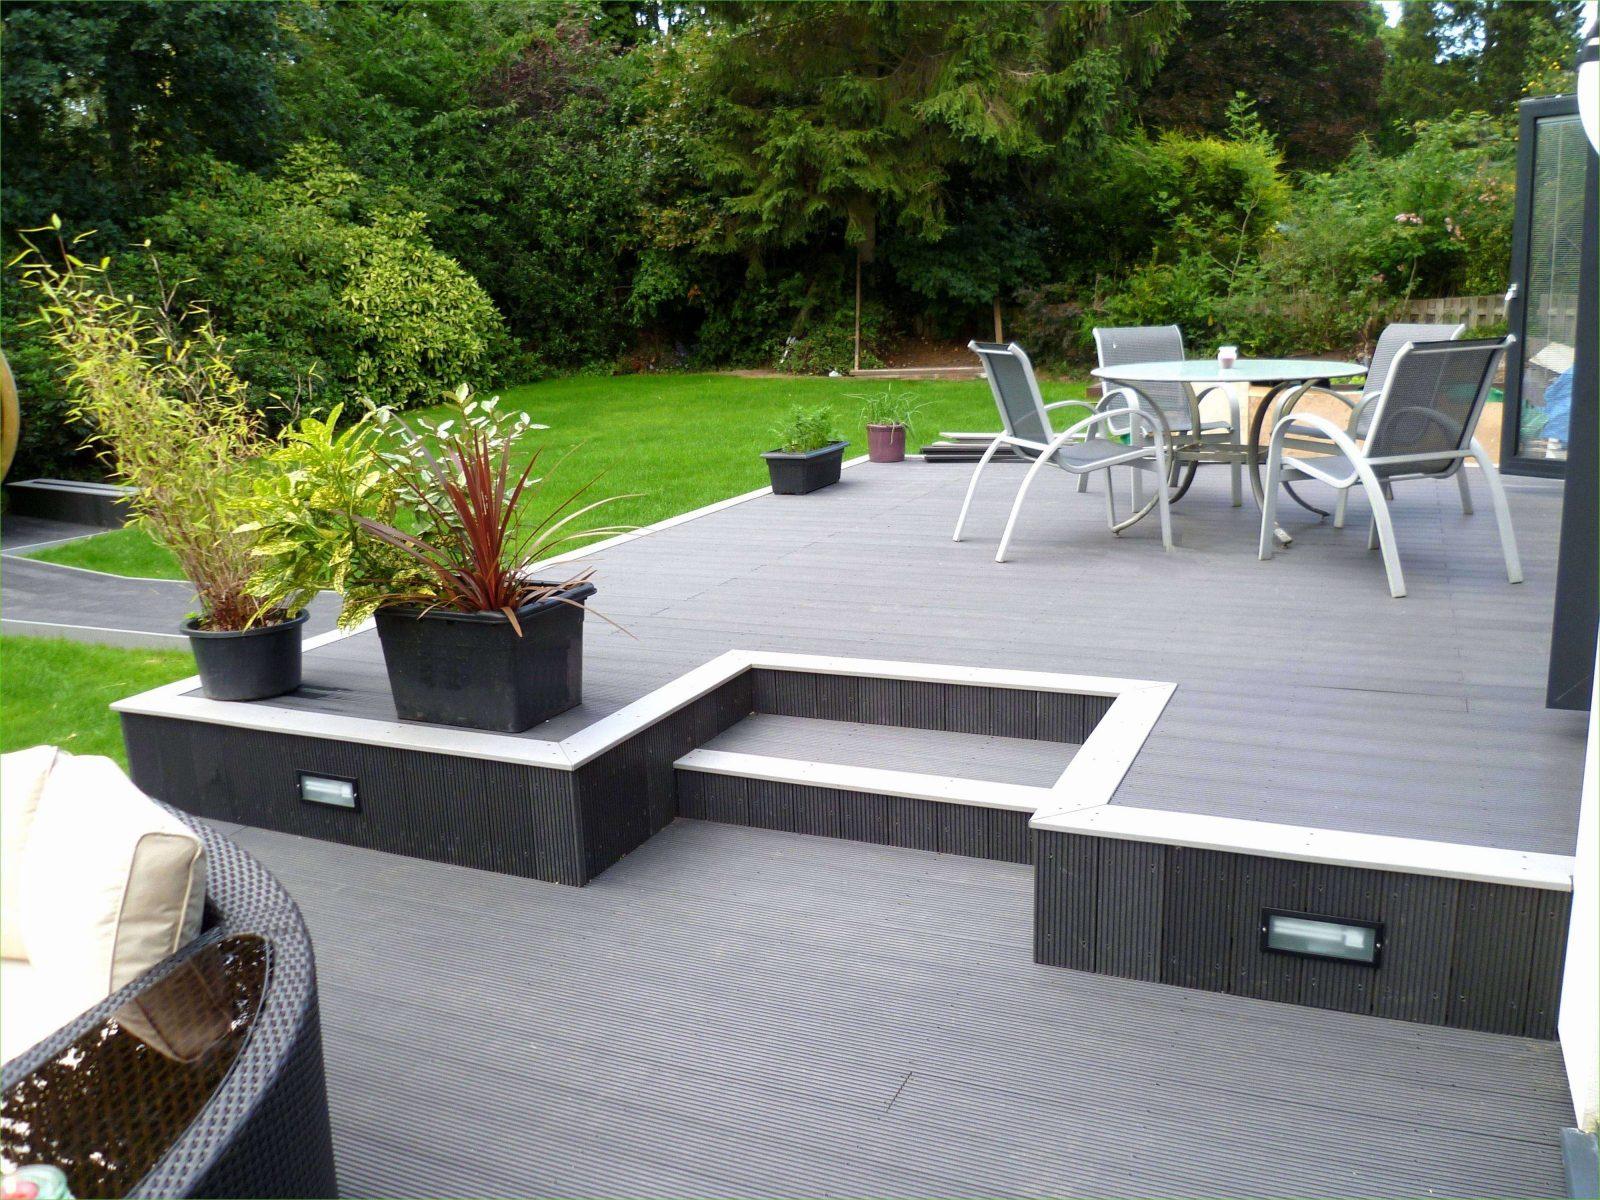 Gartenkamin Grill Selber Bauen – Shanglin Design Von Mauer Garten von Gartenkamin Grill Selber Bauen Bild